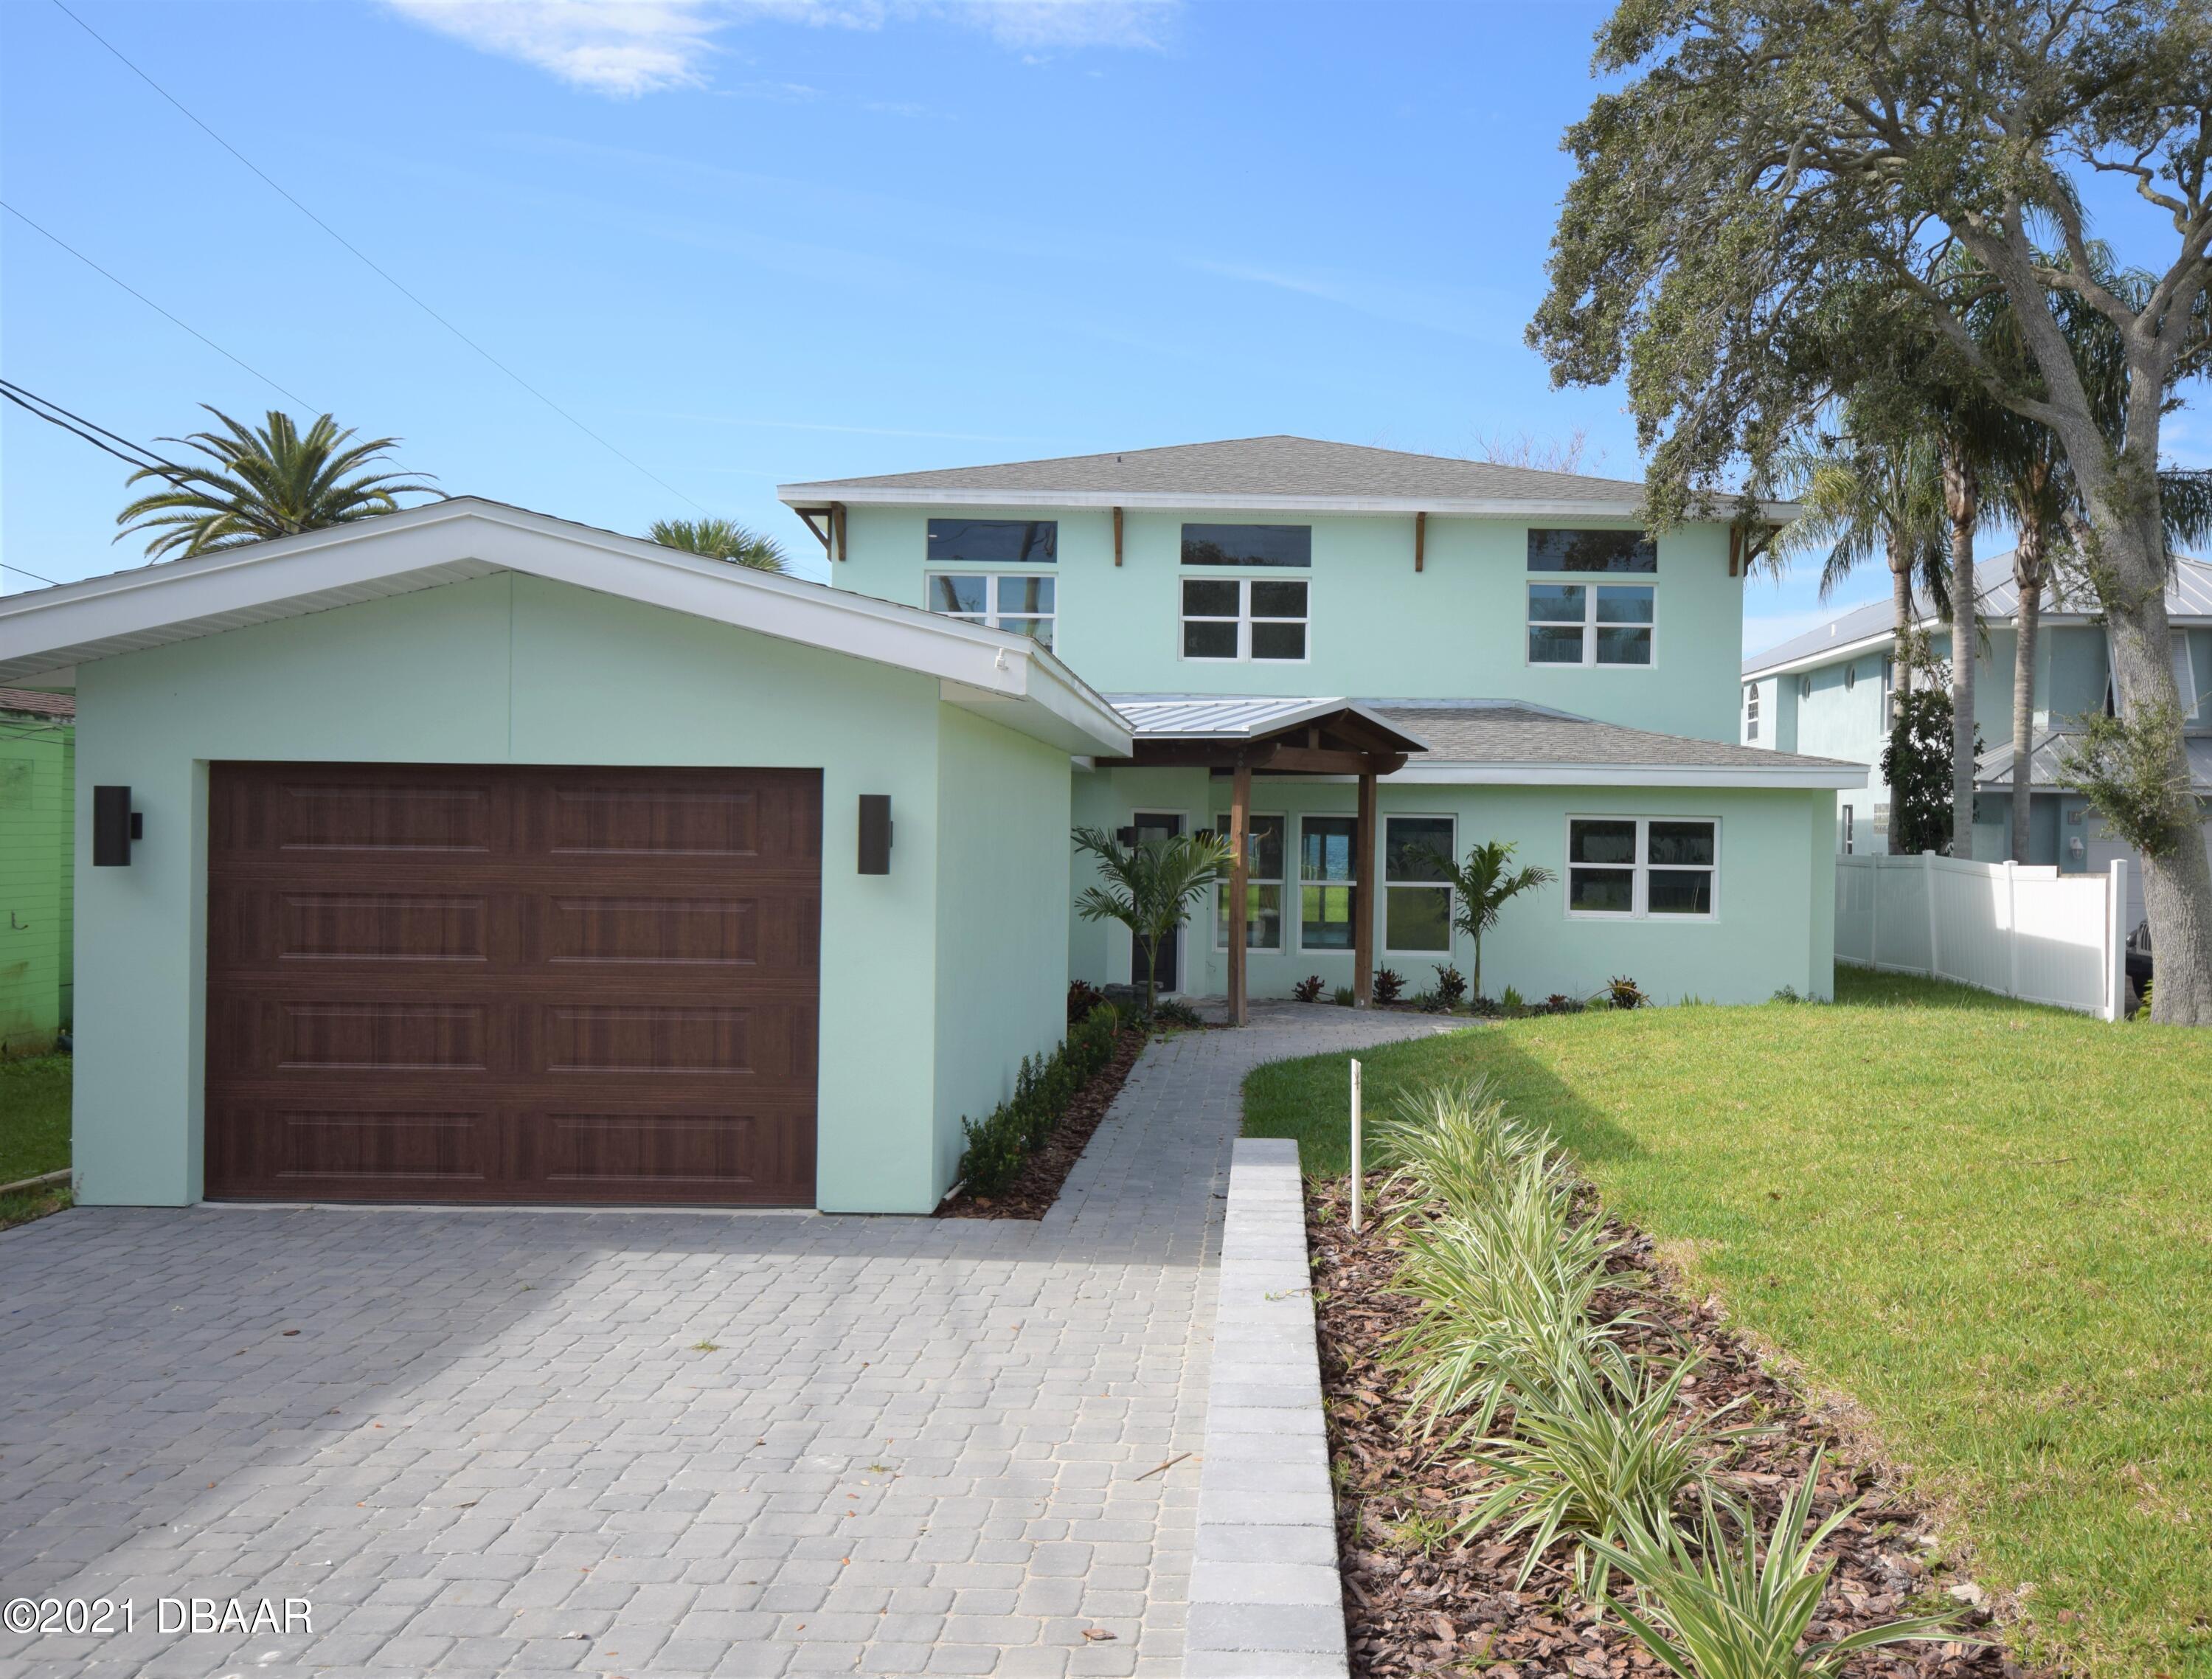 Details for 1544 John Anderson Drive, Ormond Beach, FL 32176